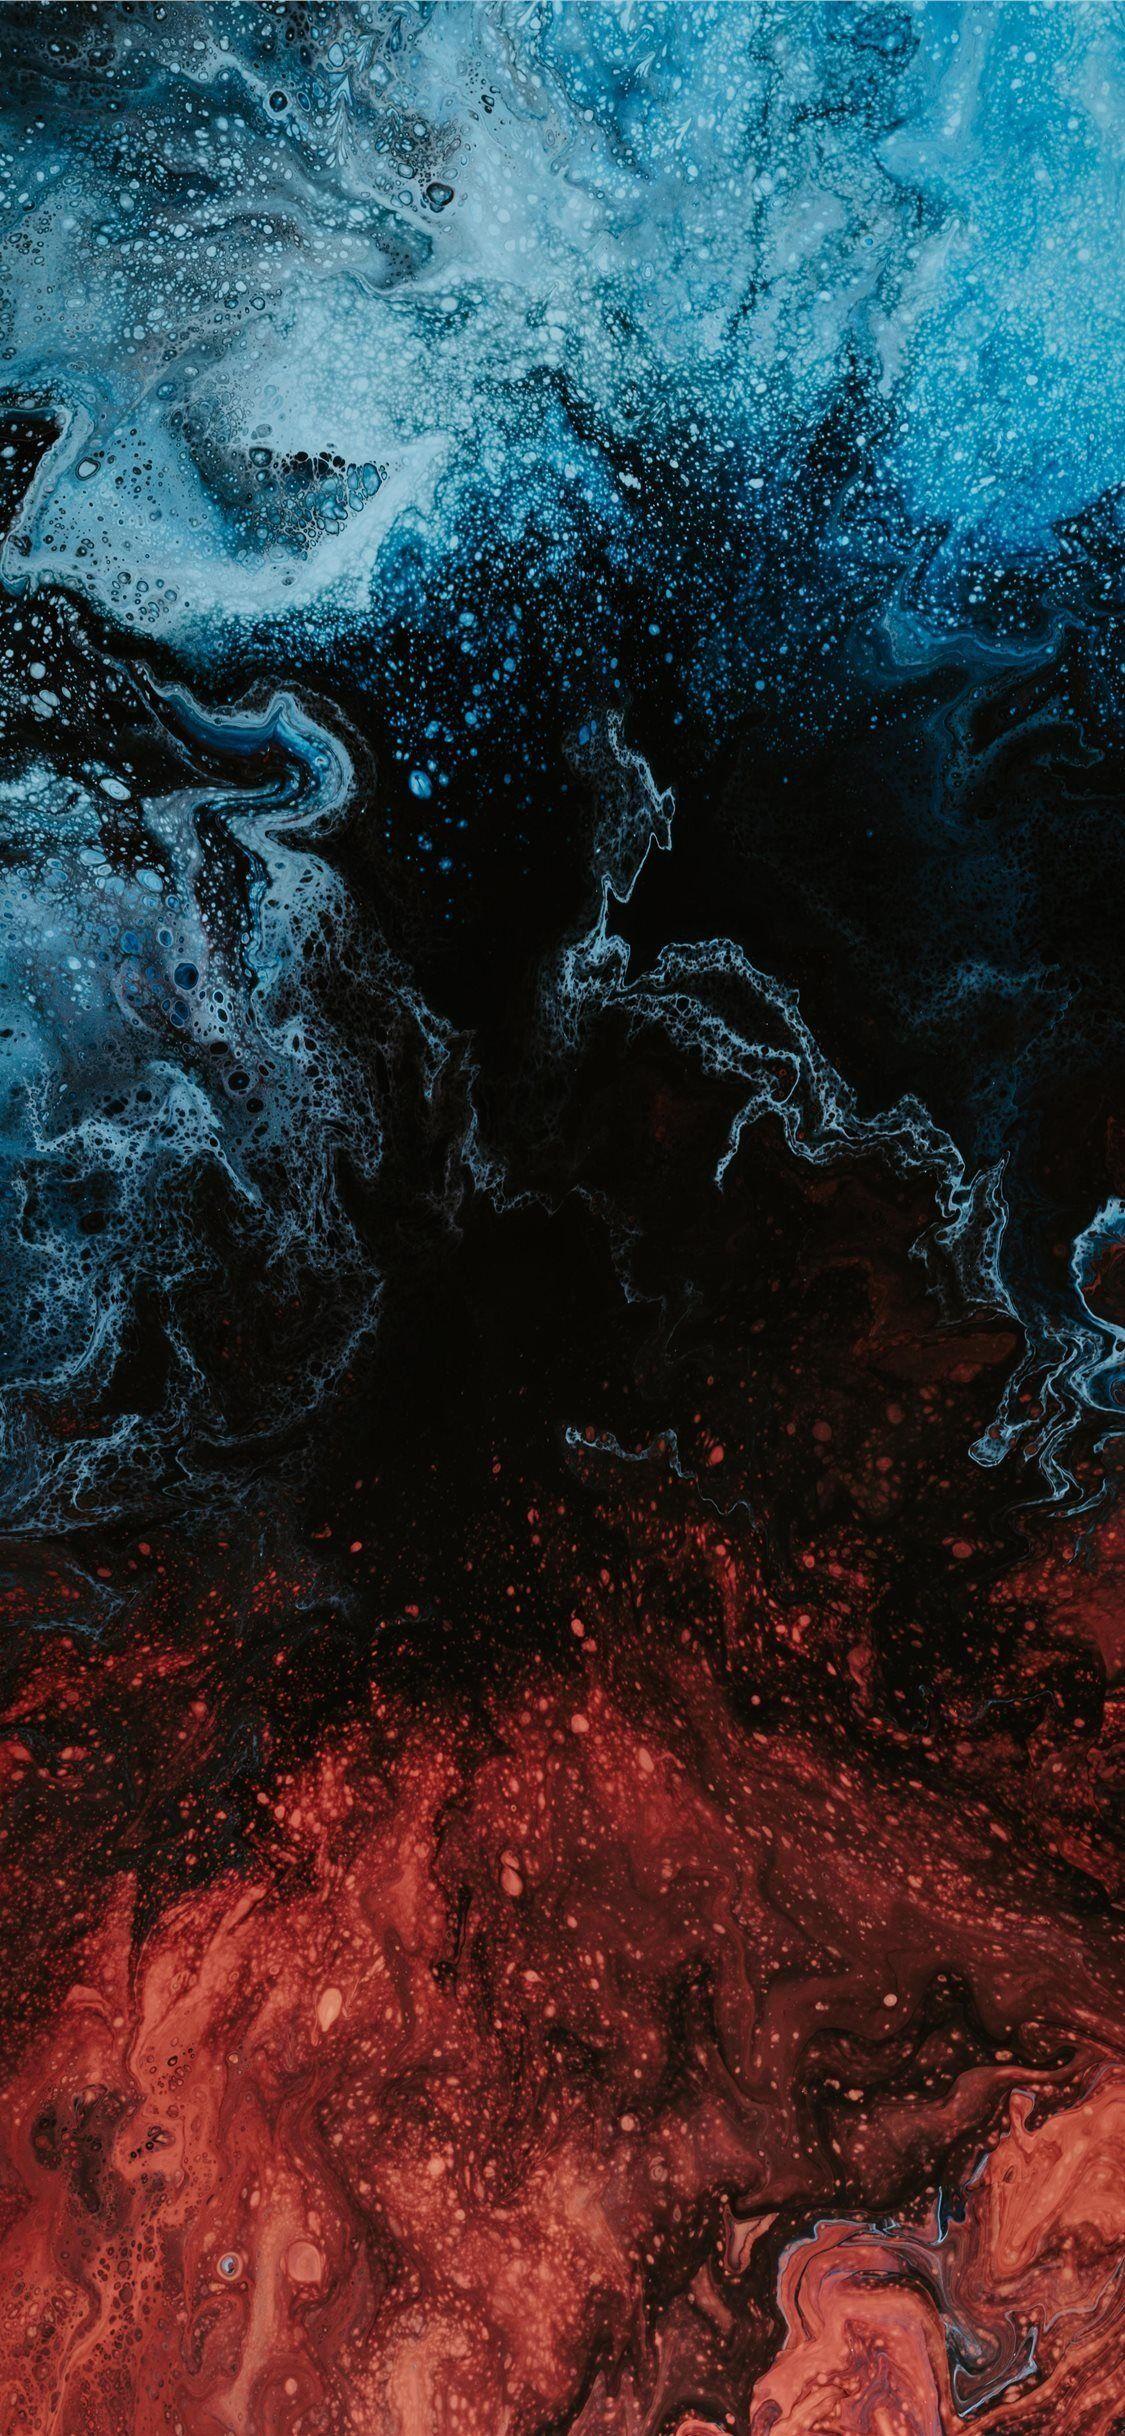 Full HD 4k iPhone Wallpapers - Wallpaper Cave